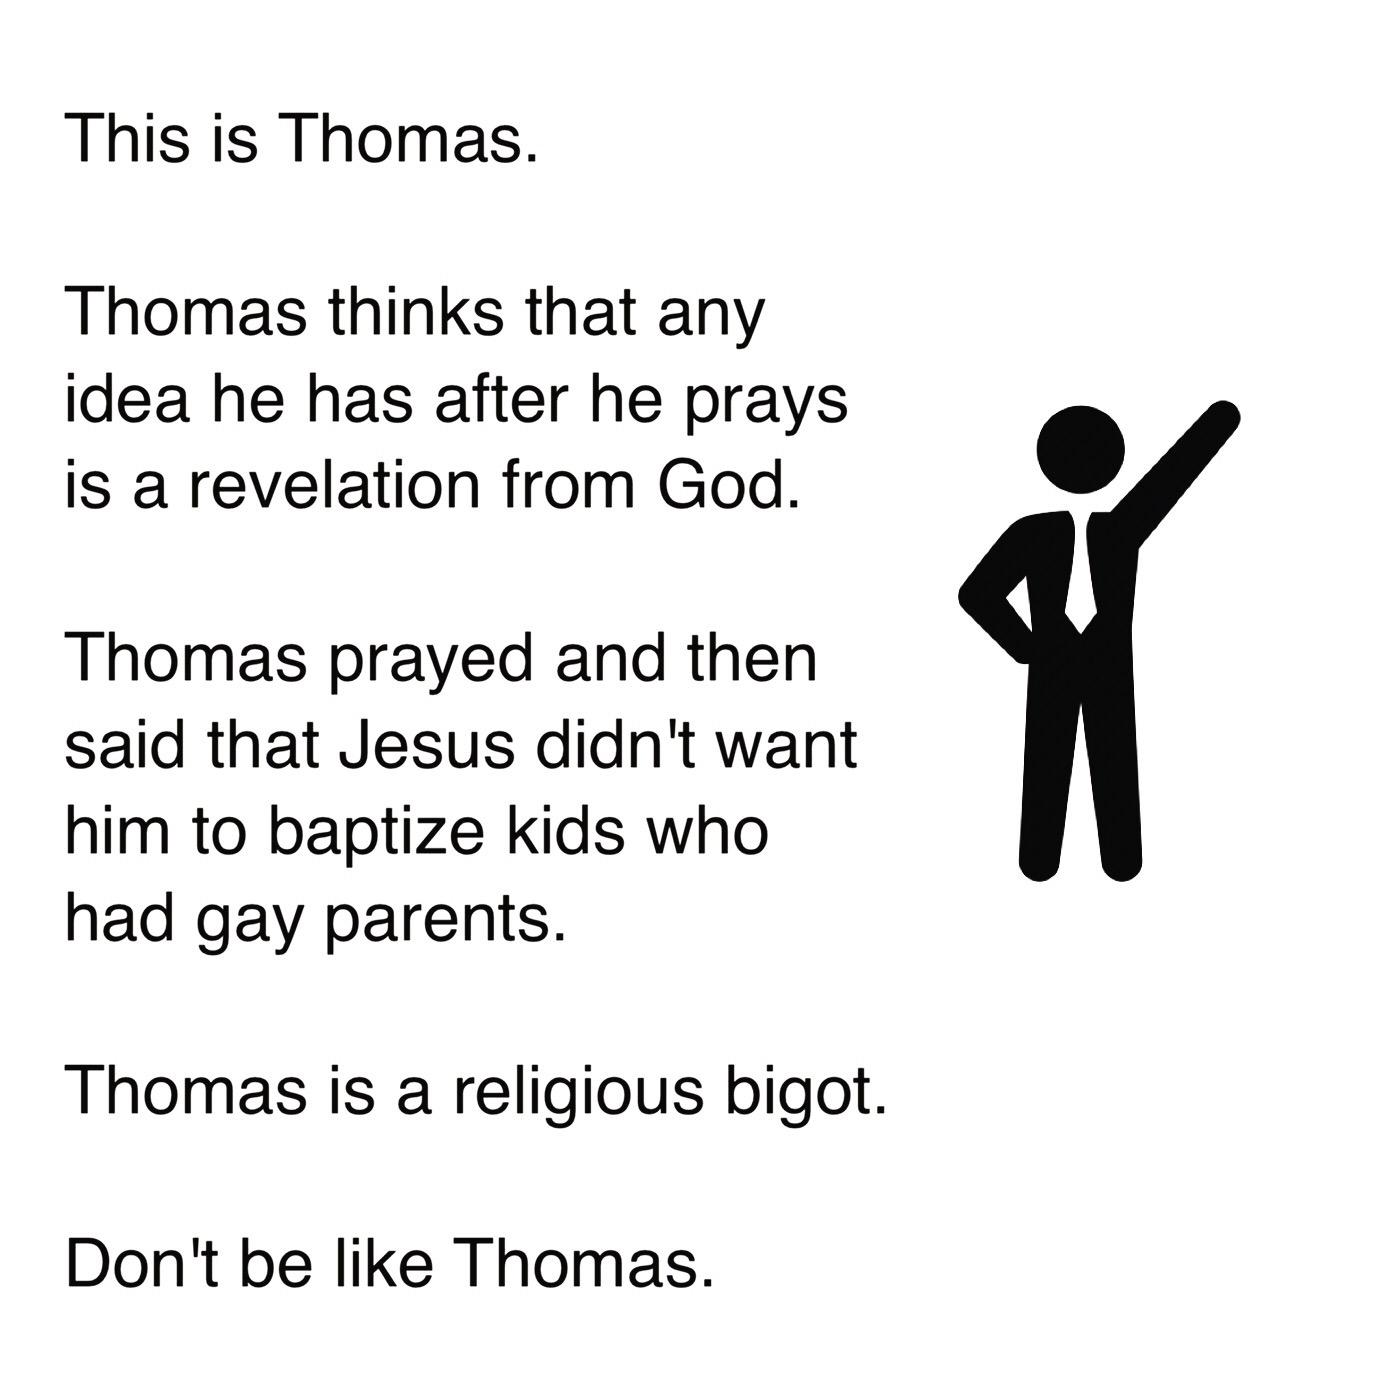 Don't be like Thomas